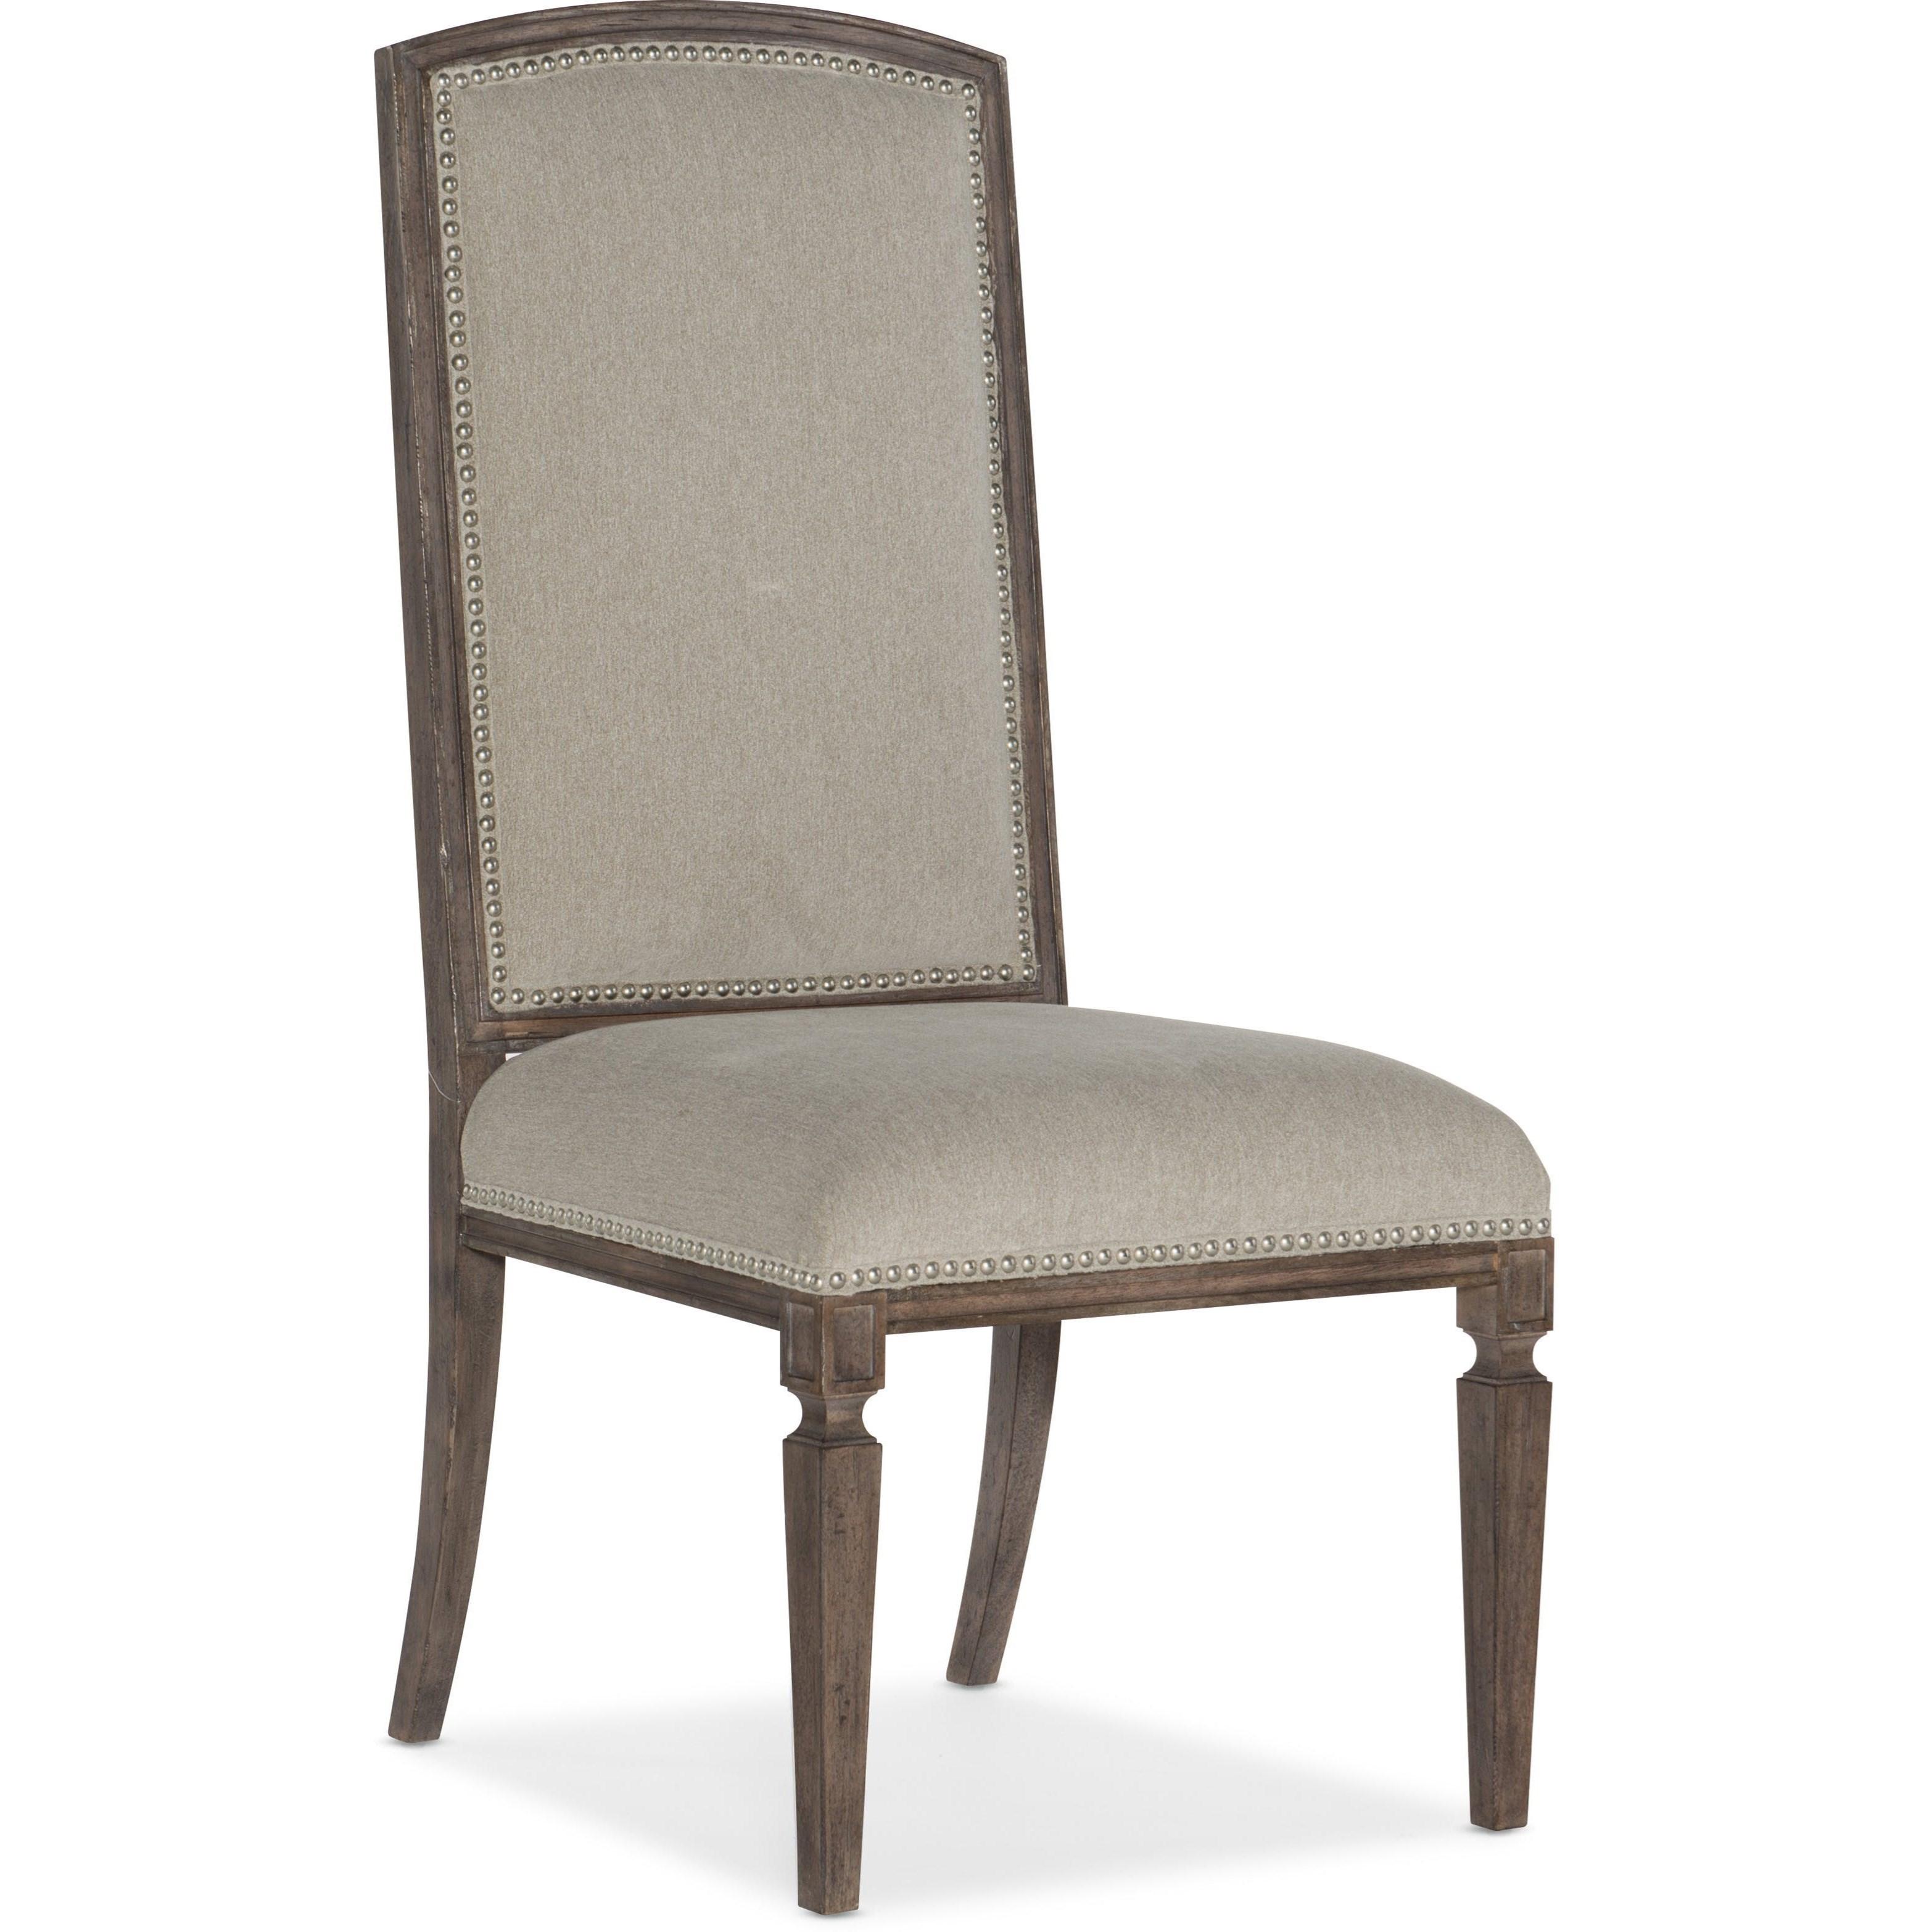 Woodlands Arched Upholstered Side Chair by Hooker Furniture at Baer's Furniture